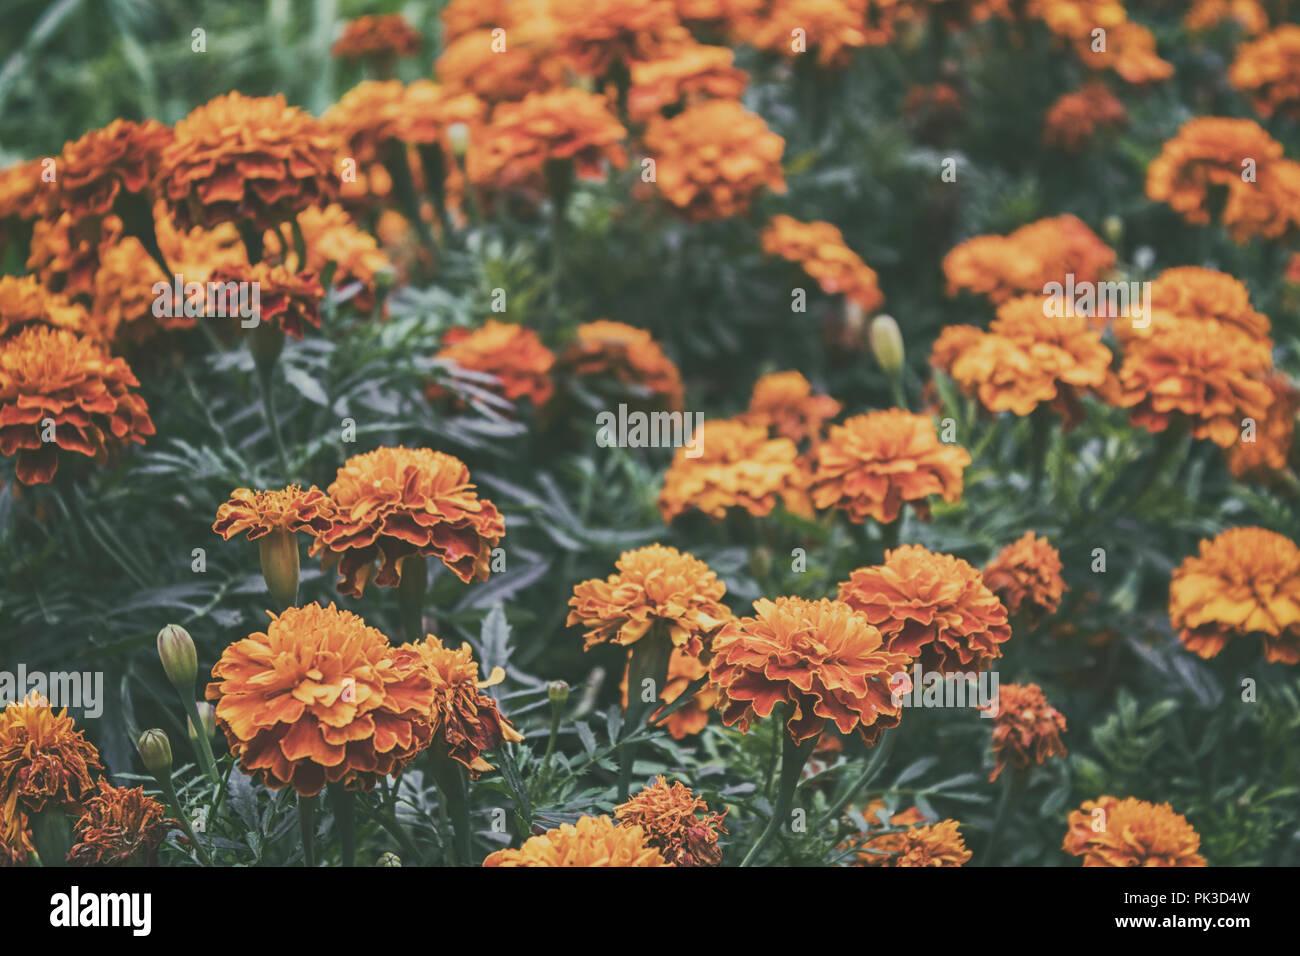 Marigold flowers. Garden flowers. Yellow flowers. Orange flowers. Summer flowers. Stock Photo